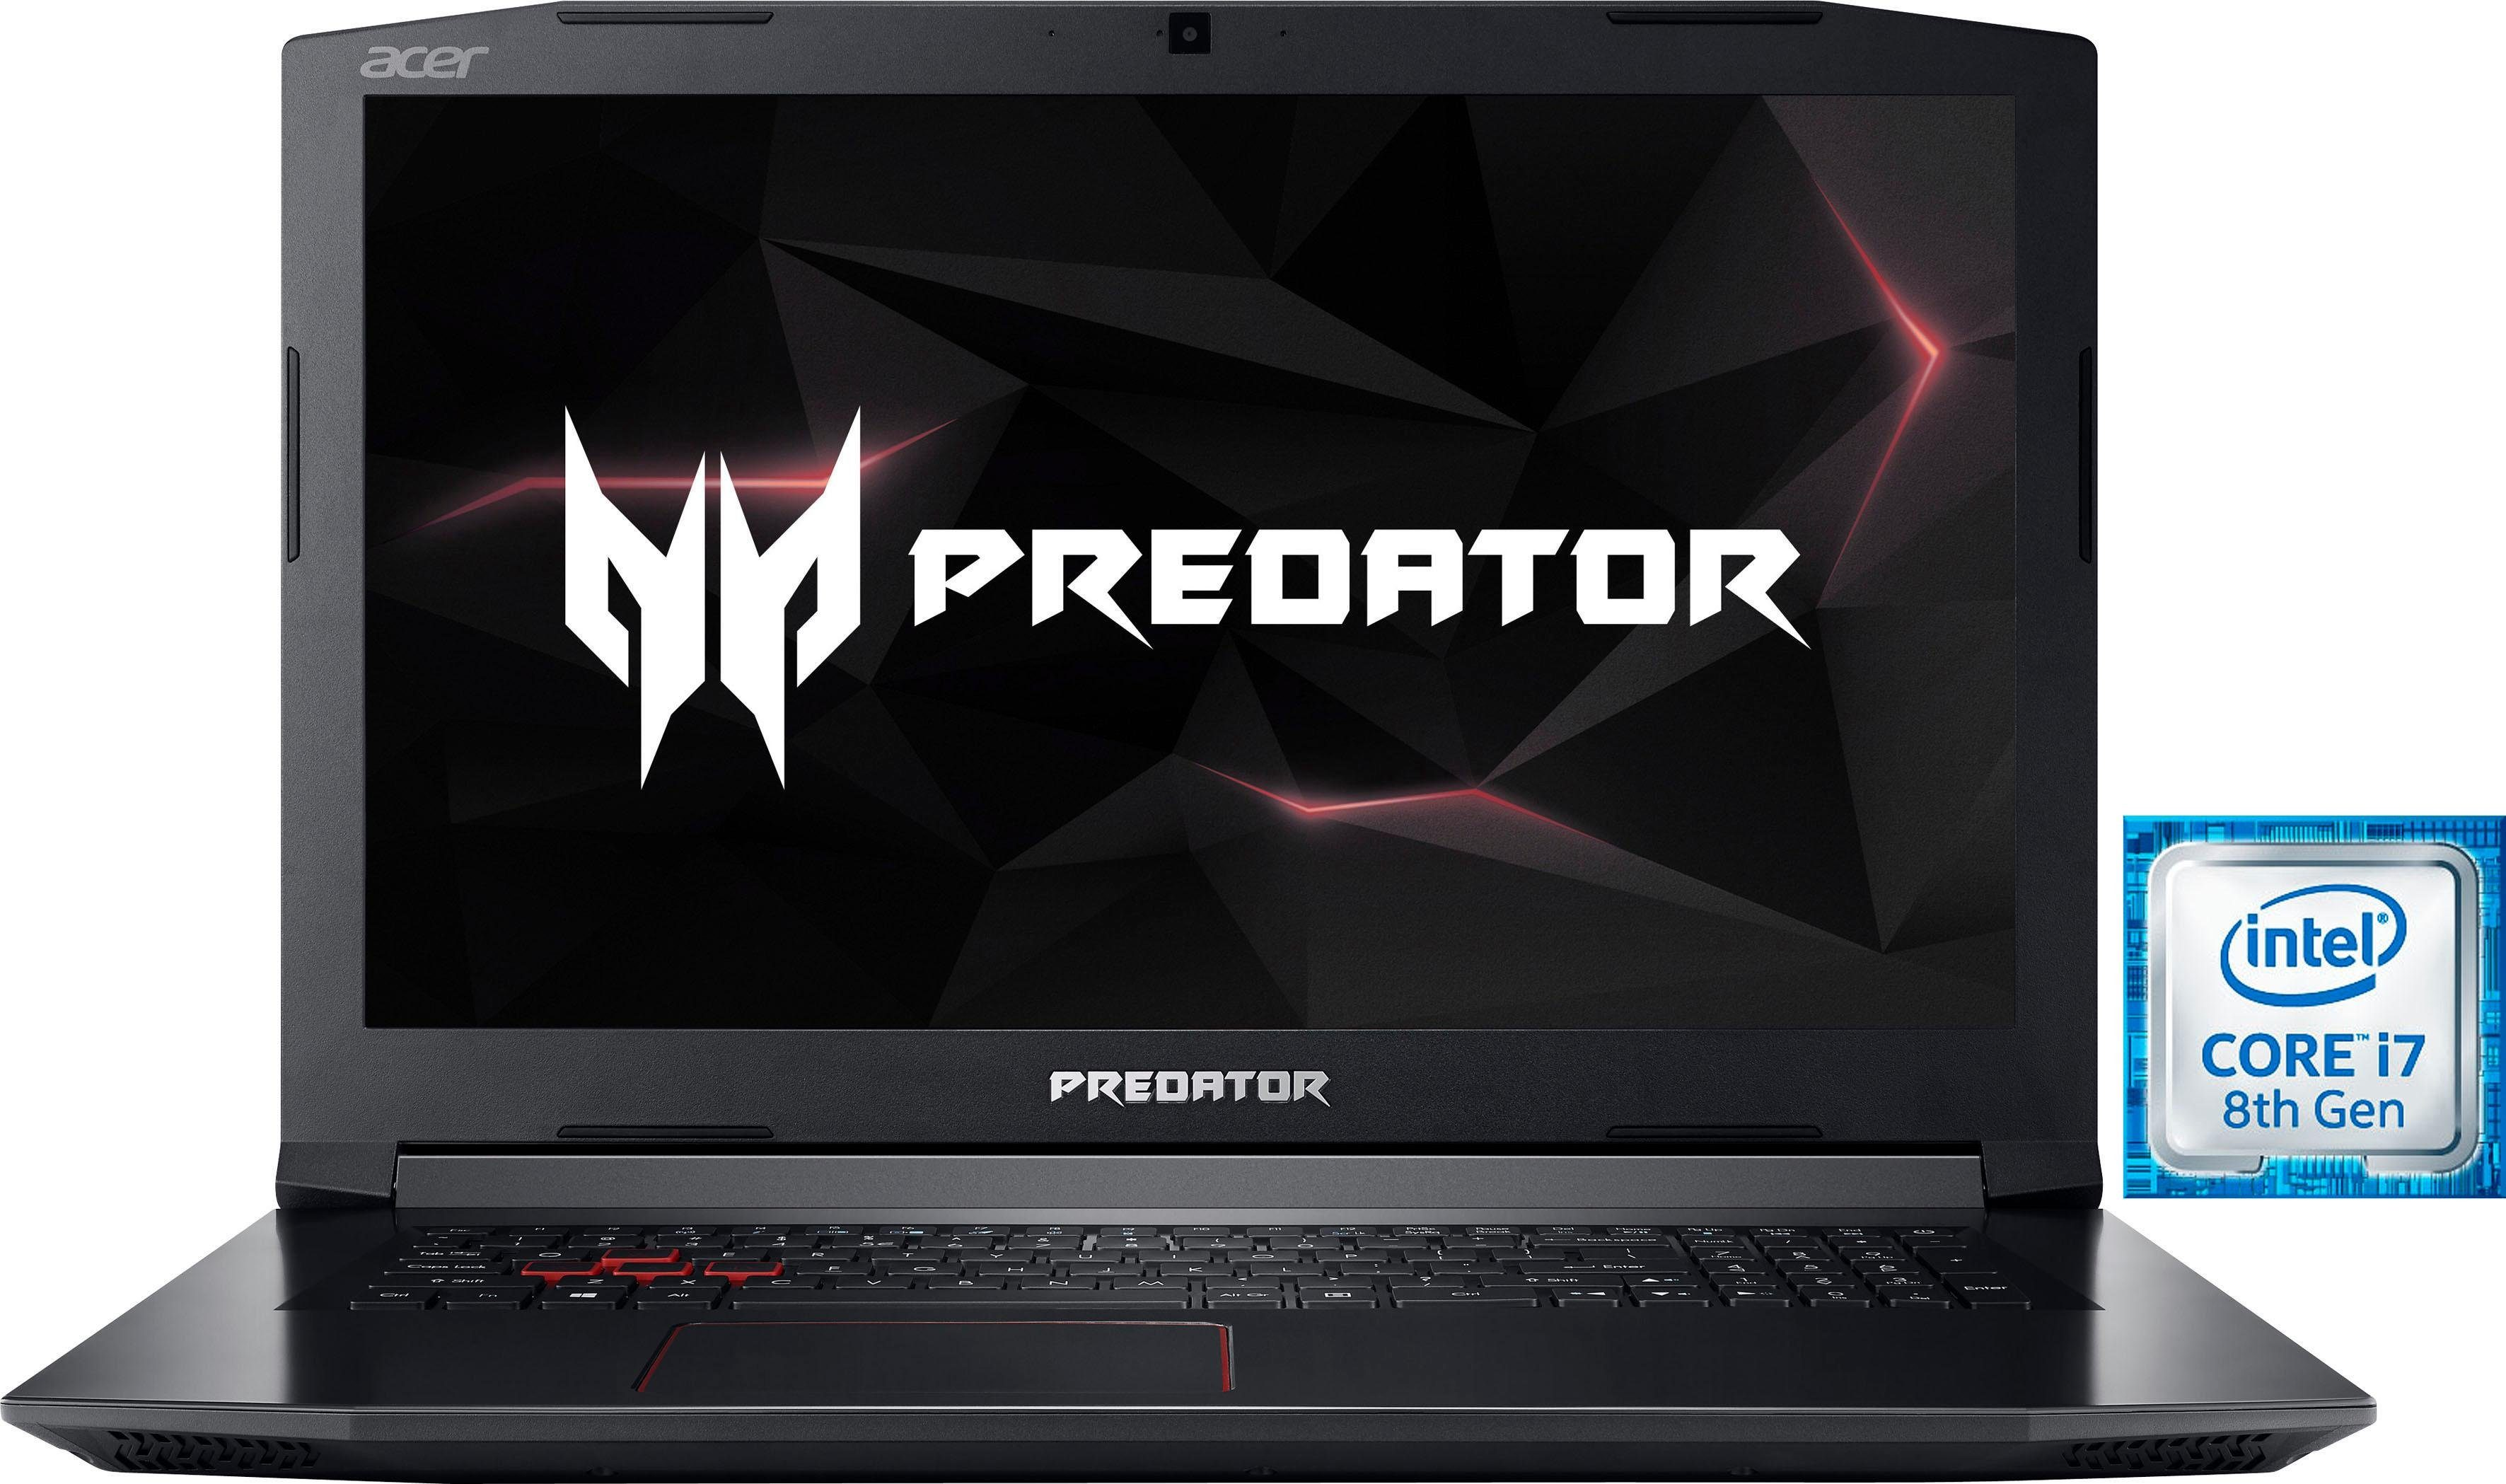 Acer Predator Helios 300 (PH317-52-74AJ) Gaming-Notebook (43,9 cm/17,3 Zoll, Intel Core i7, GeForce, 1000 GB HDD, 128 GB SSD, inkl. Office 365 Personal (ESD)